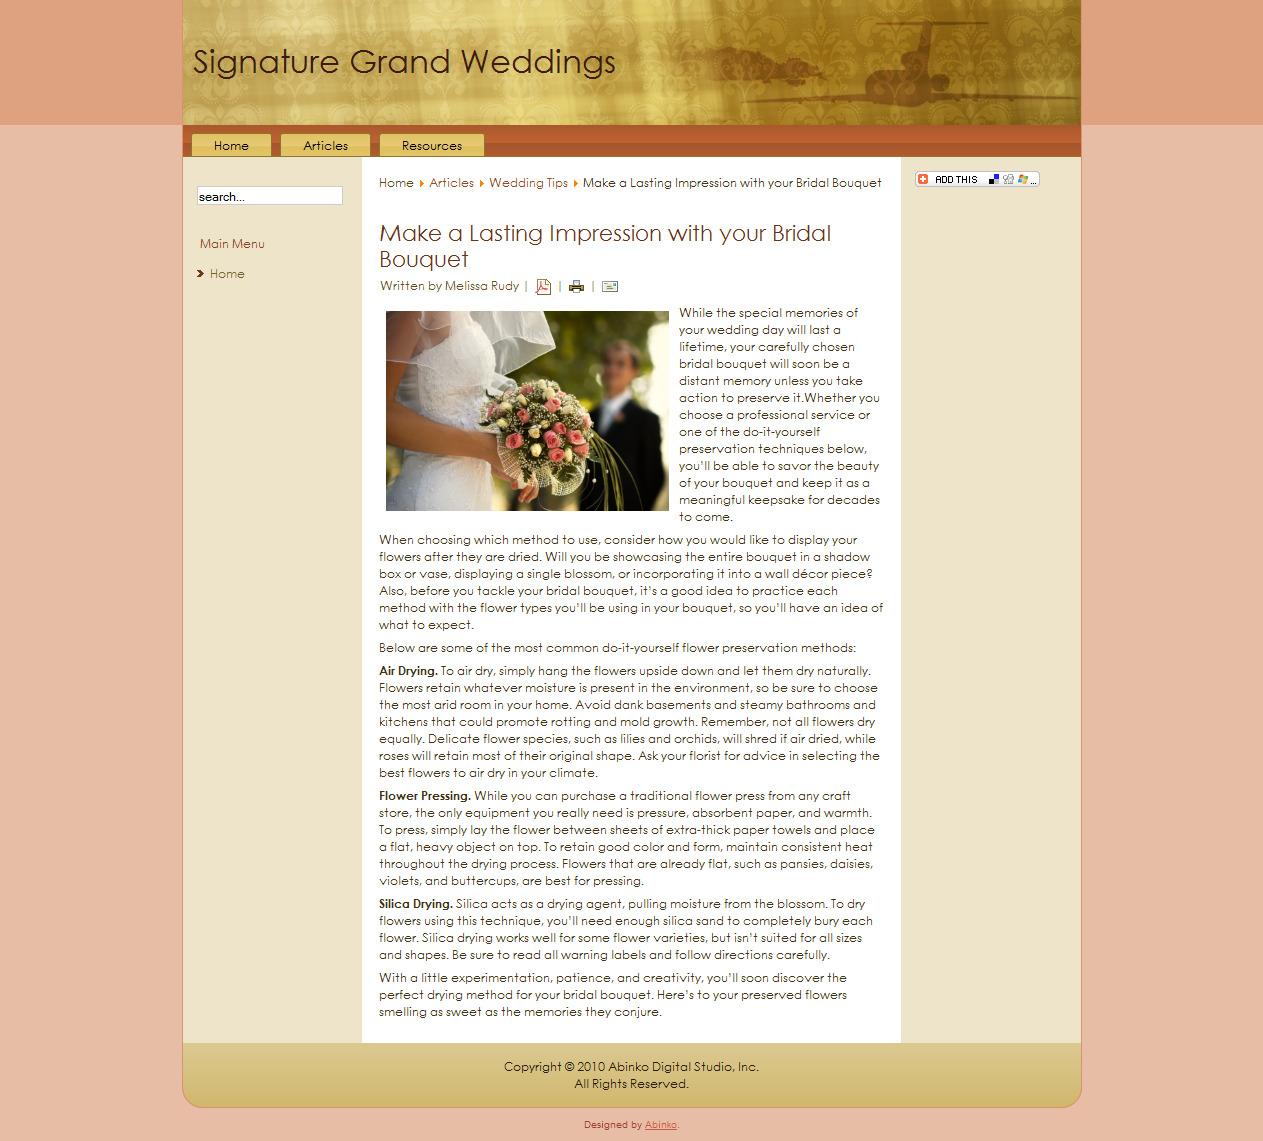 Wedding Article: Preserving Your Bridal Bouquet